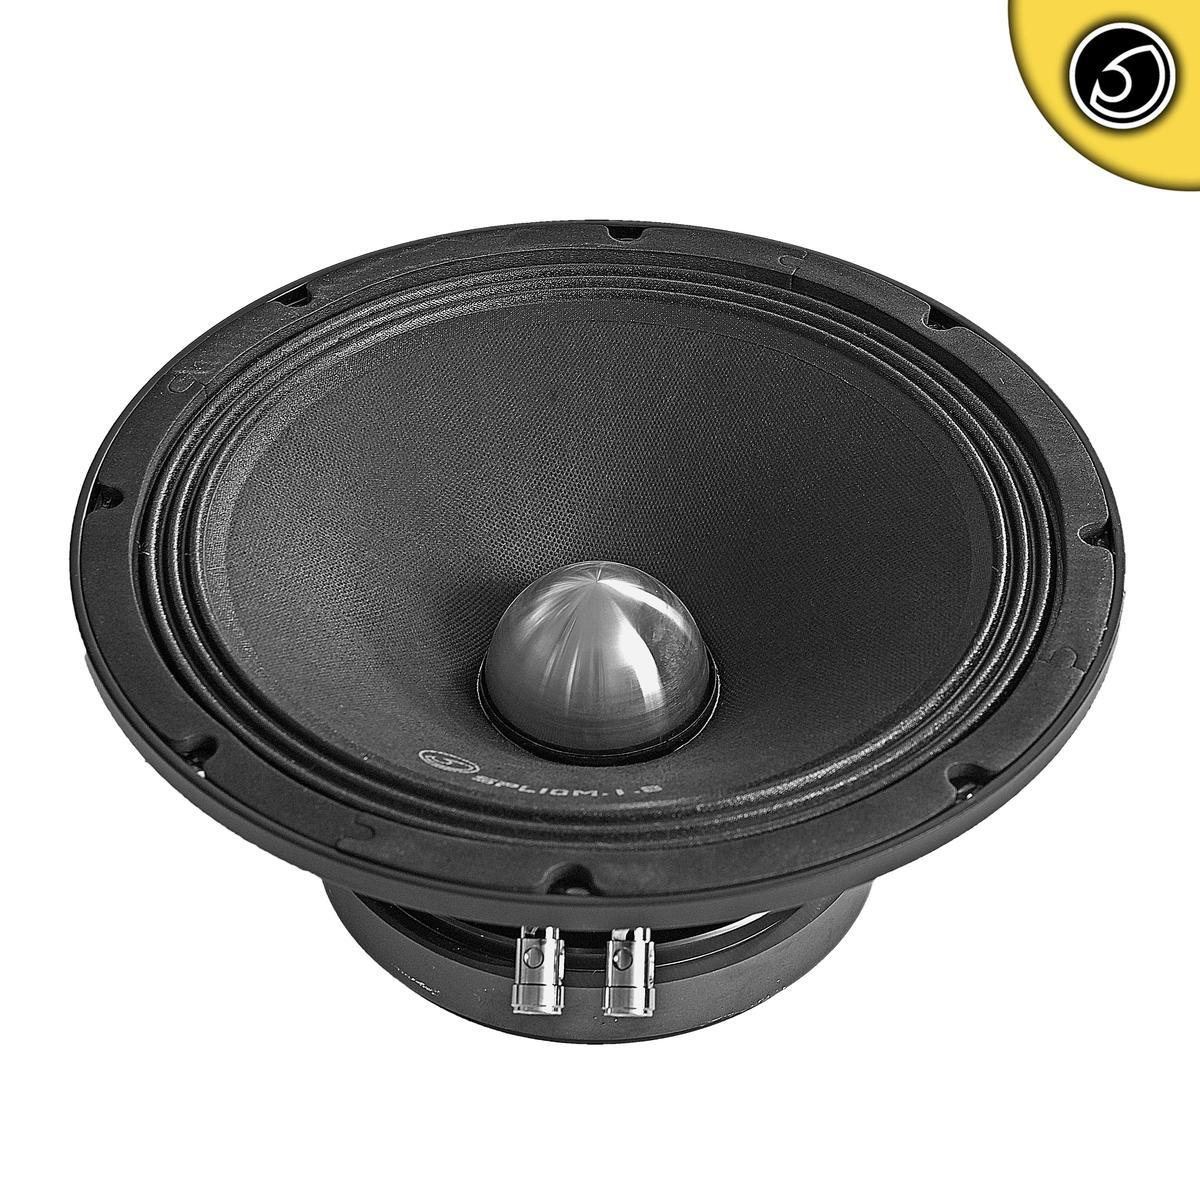 "Bassface SPL10M.1s 800w 10"" 25cm 8Ohm Midrange Midbass Driver SPL Speaker Single"